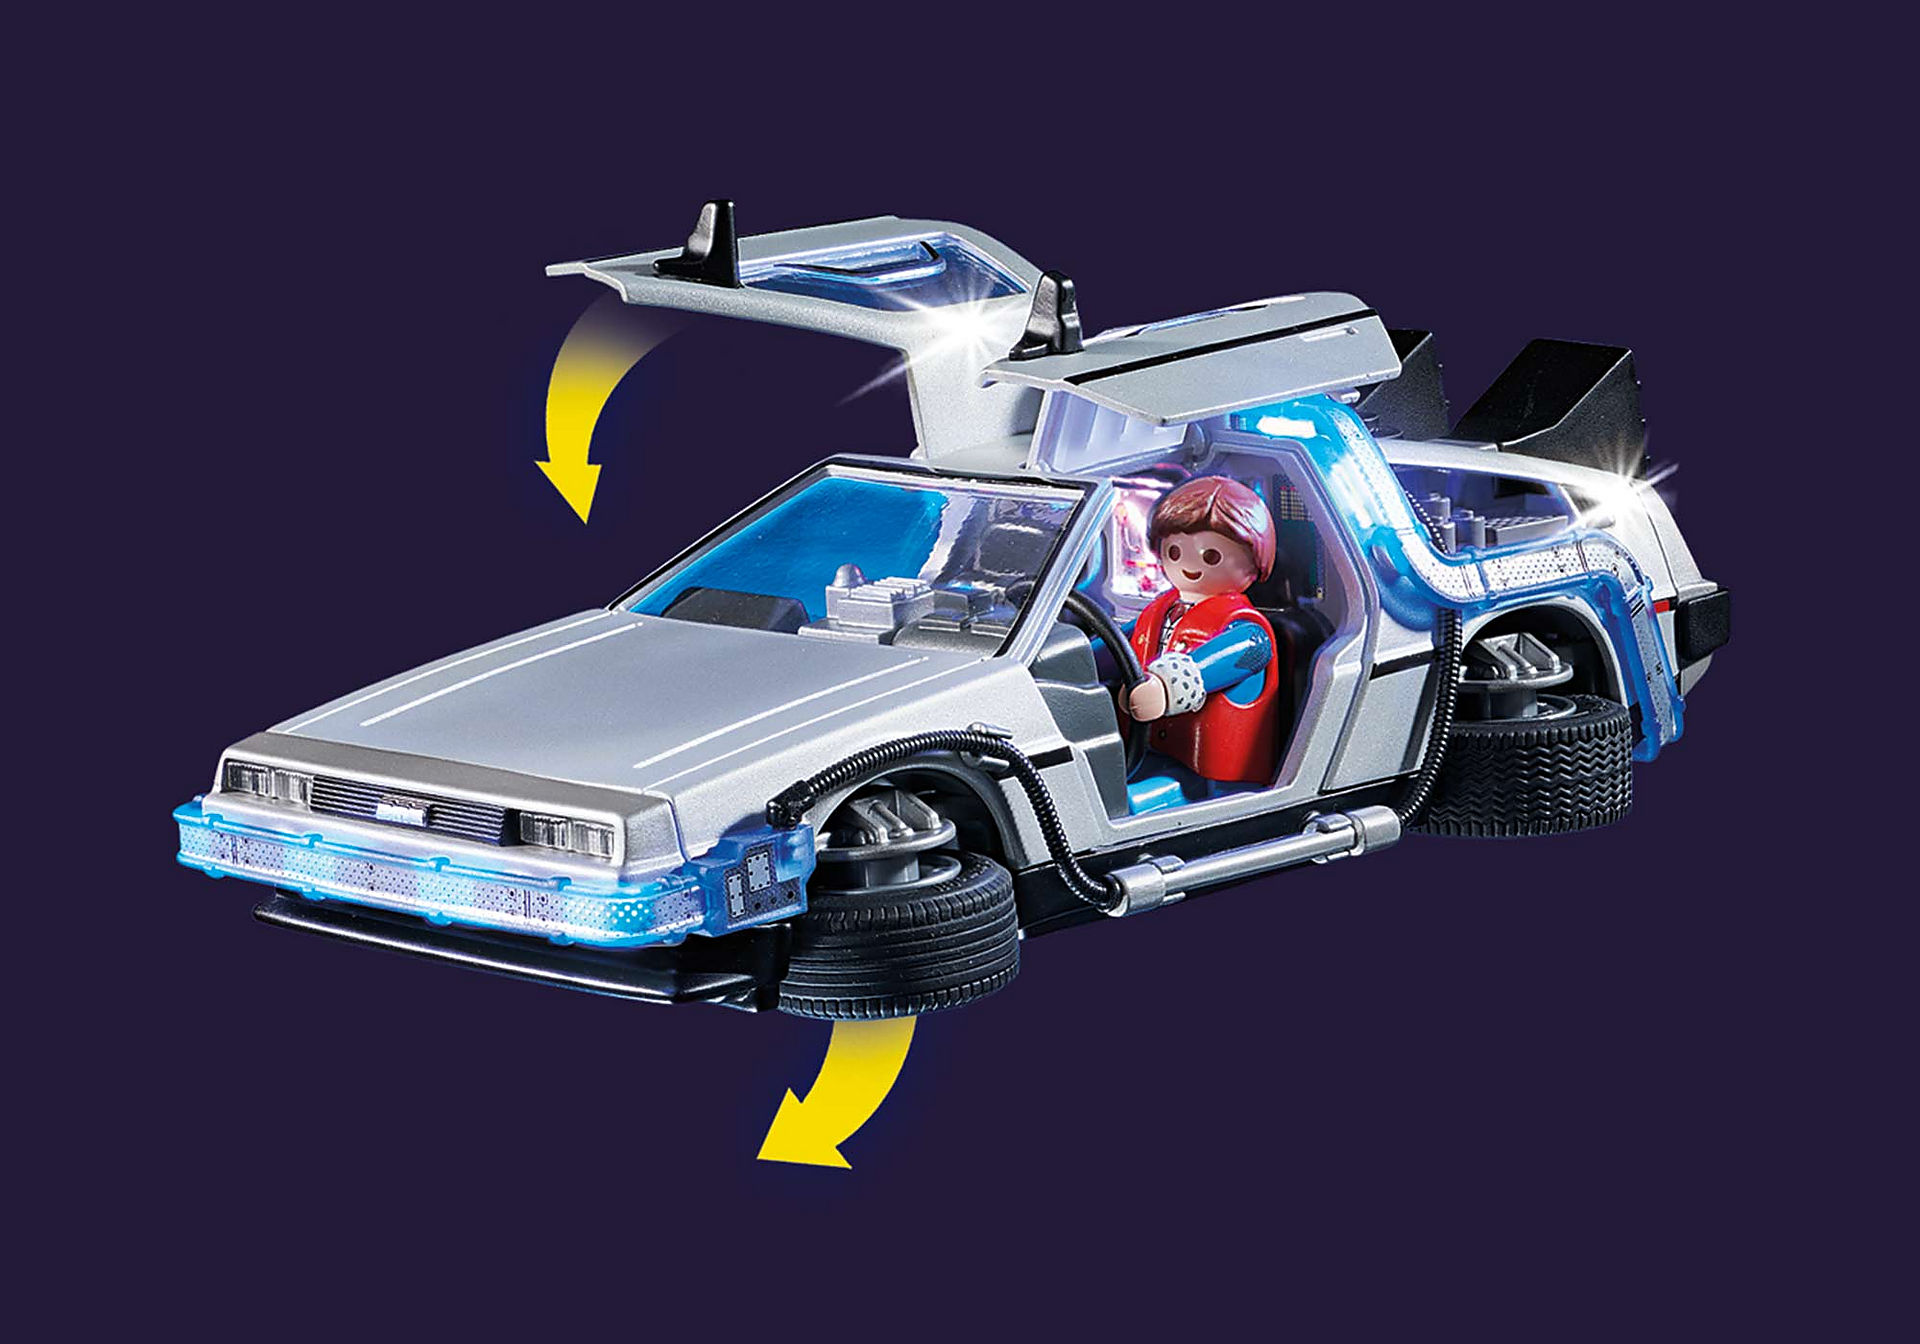 70317 Back to the Future Συλλεκτικό όχημα Ντελόριαν zoom image4